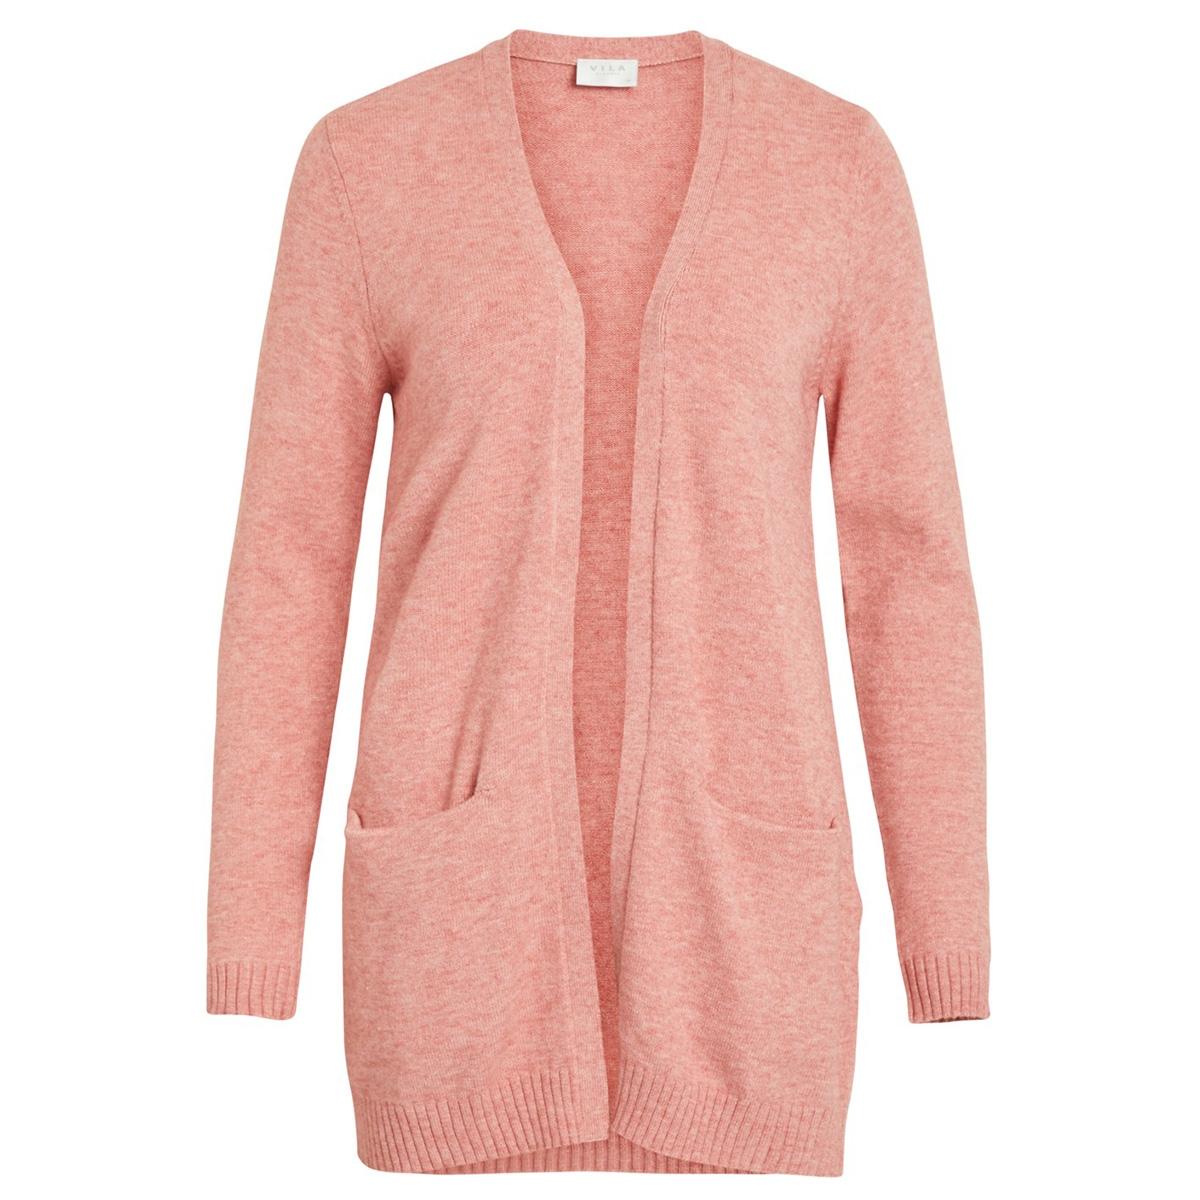 viril l/s  open knit cardigan-noos 14044041 vila vest brandie aprico/melange